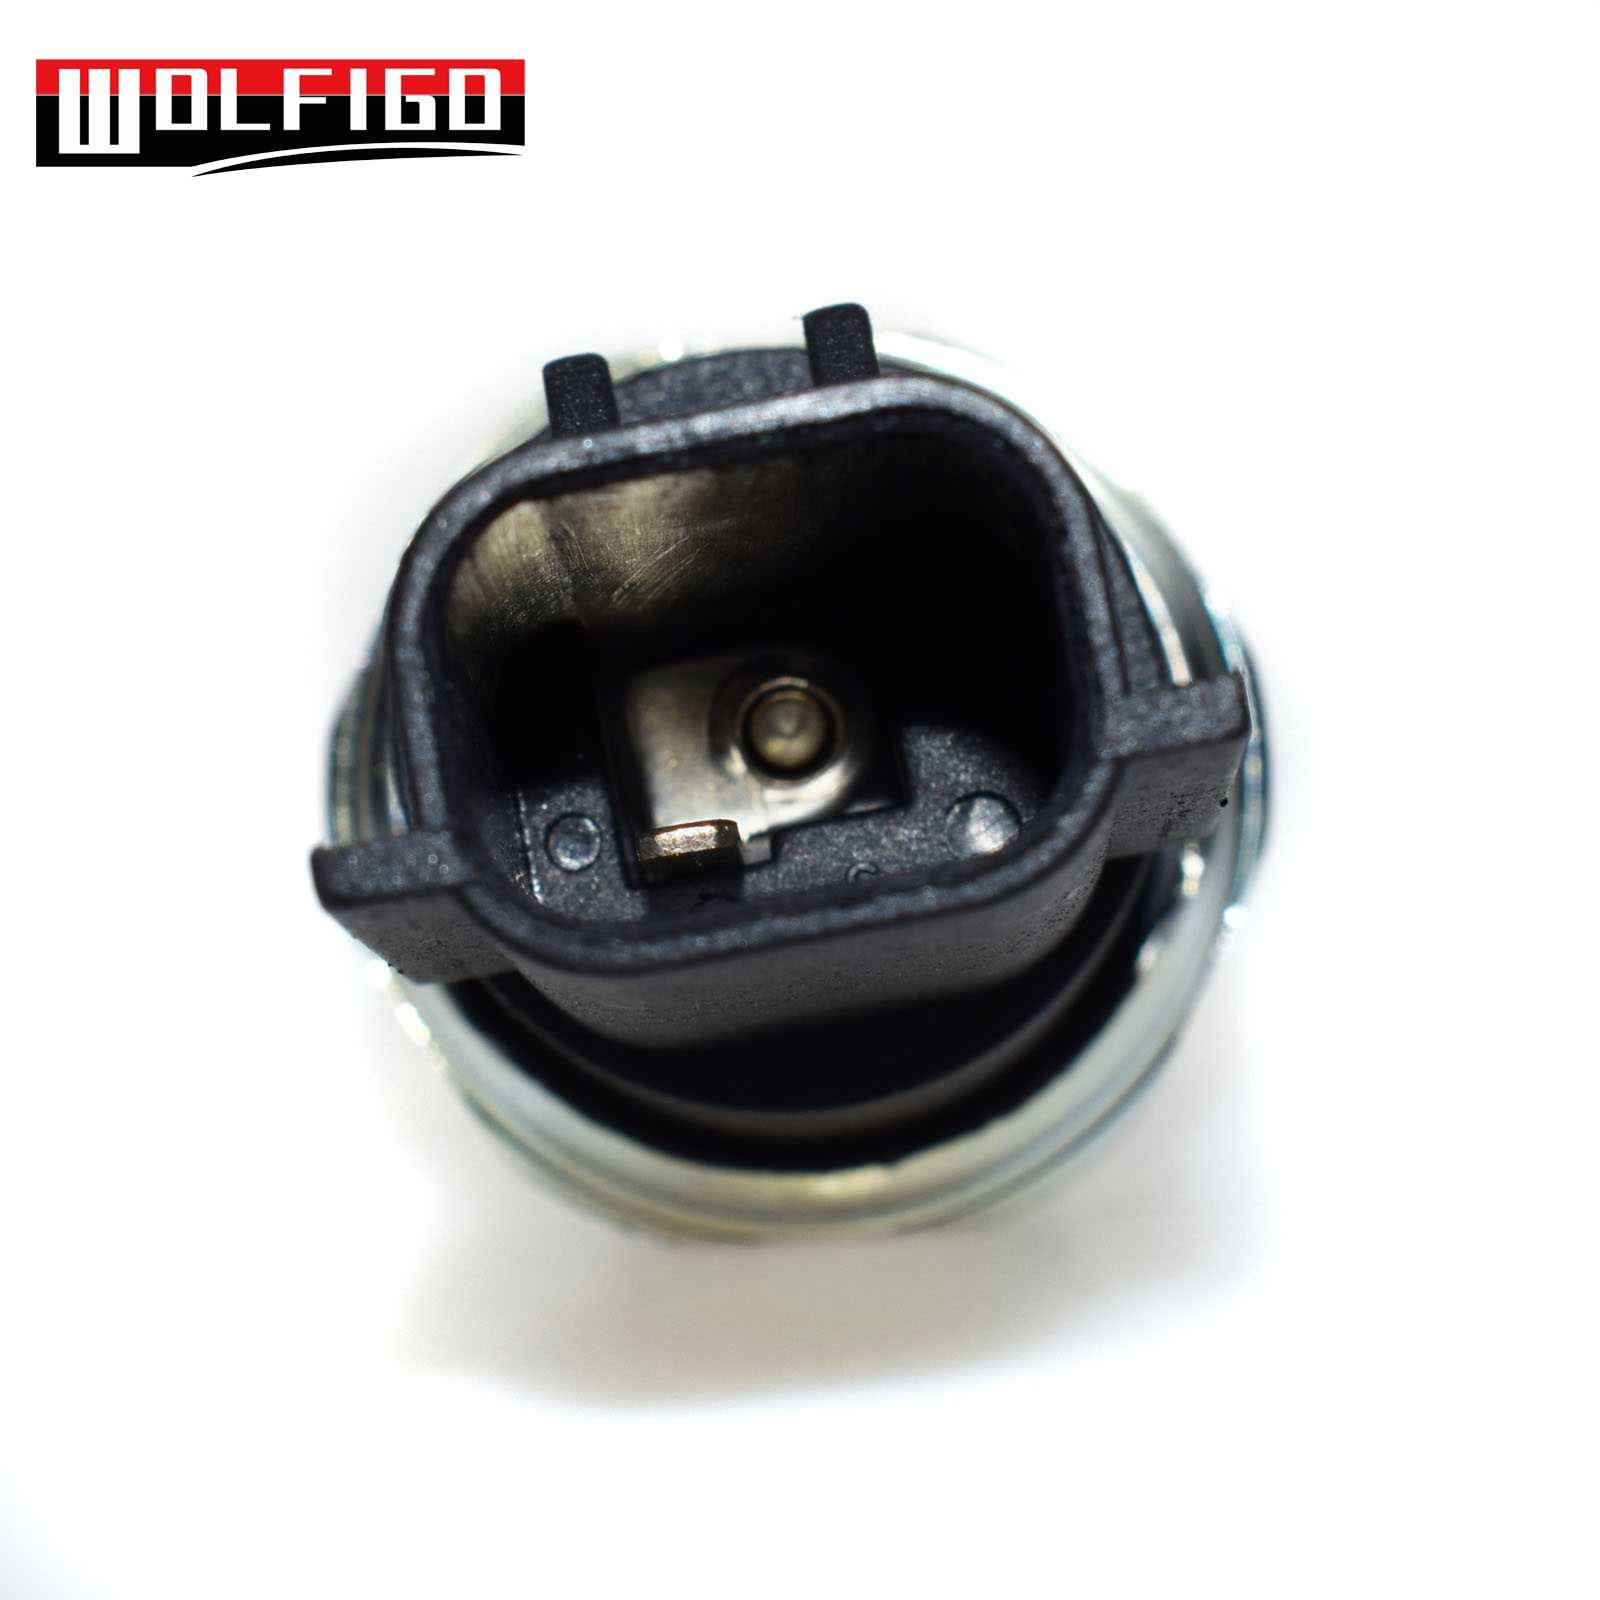 wolfigo new engine oil pressure switch sender for dodge neon voyager chrysler ps287t ps287  [ 1600 x 1600 Pixel ]